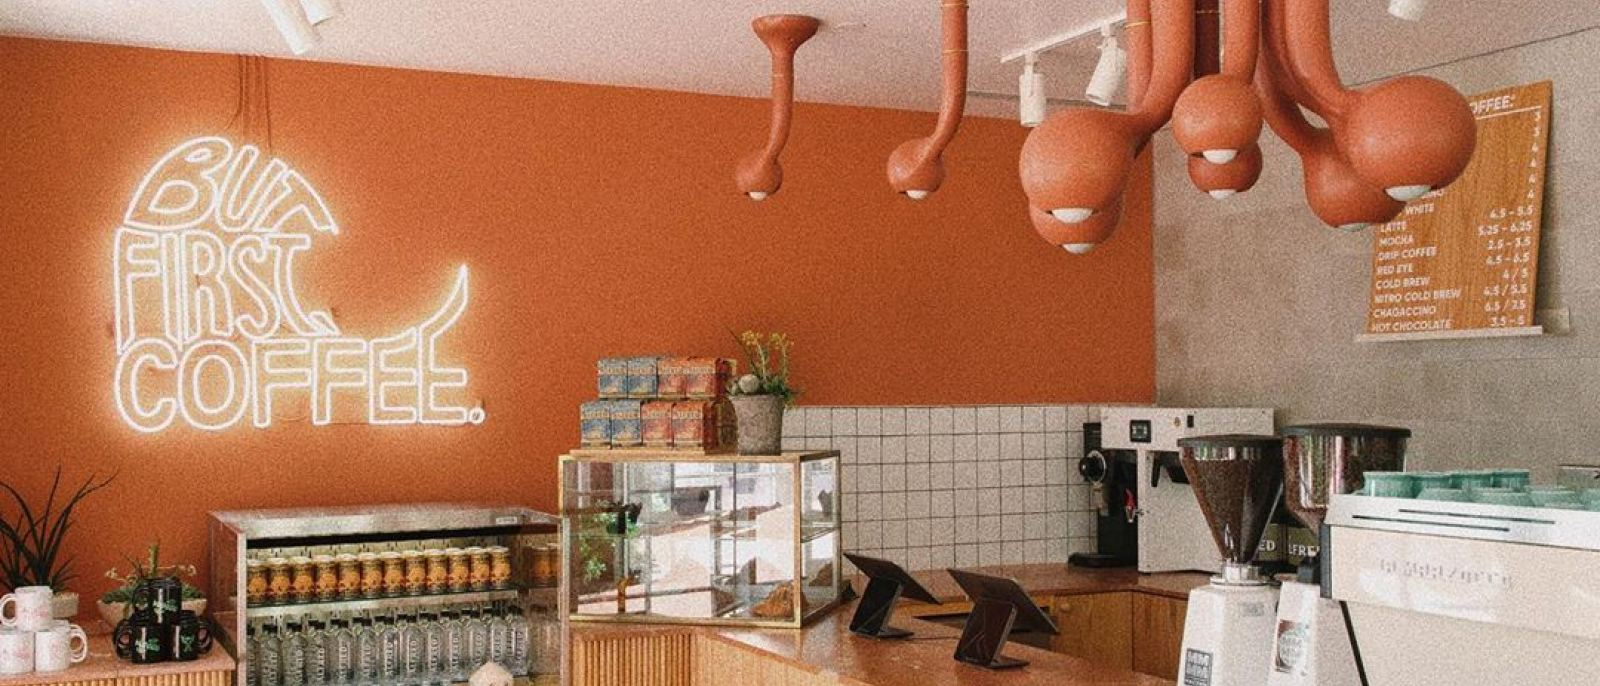 Alfred Coffee at Palisades Village